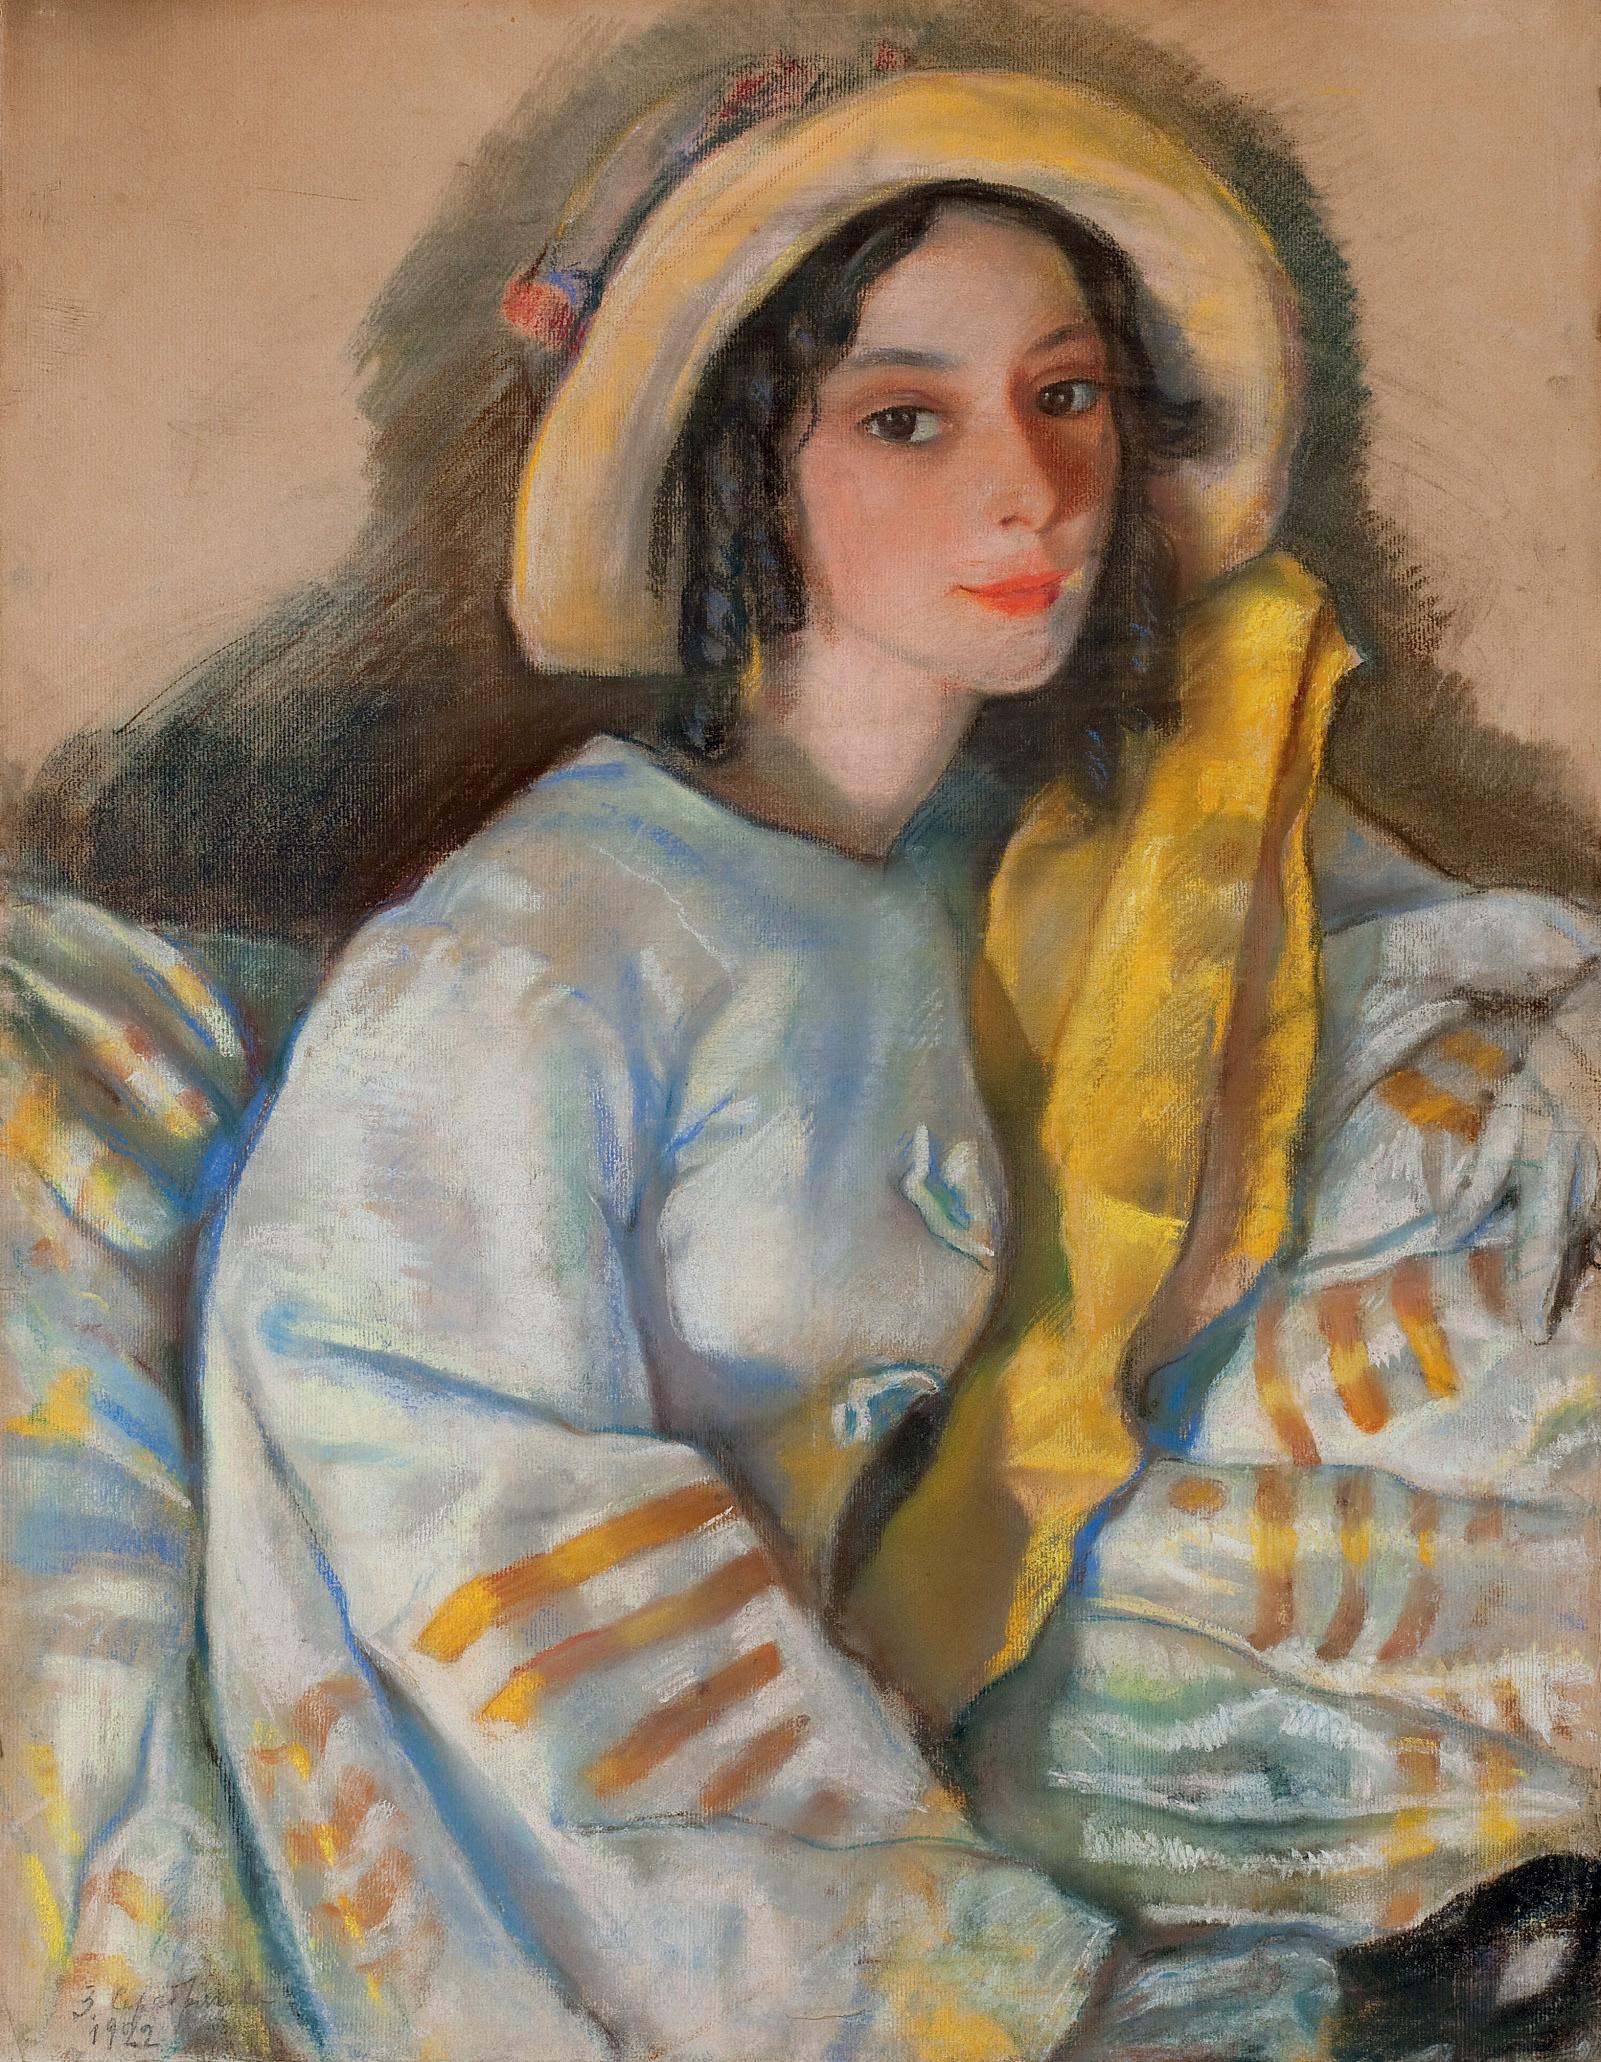 Portrait of Marietta Frangopulo (1901-1979)